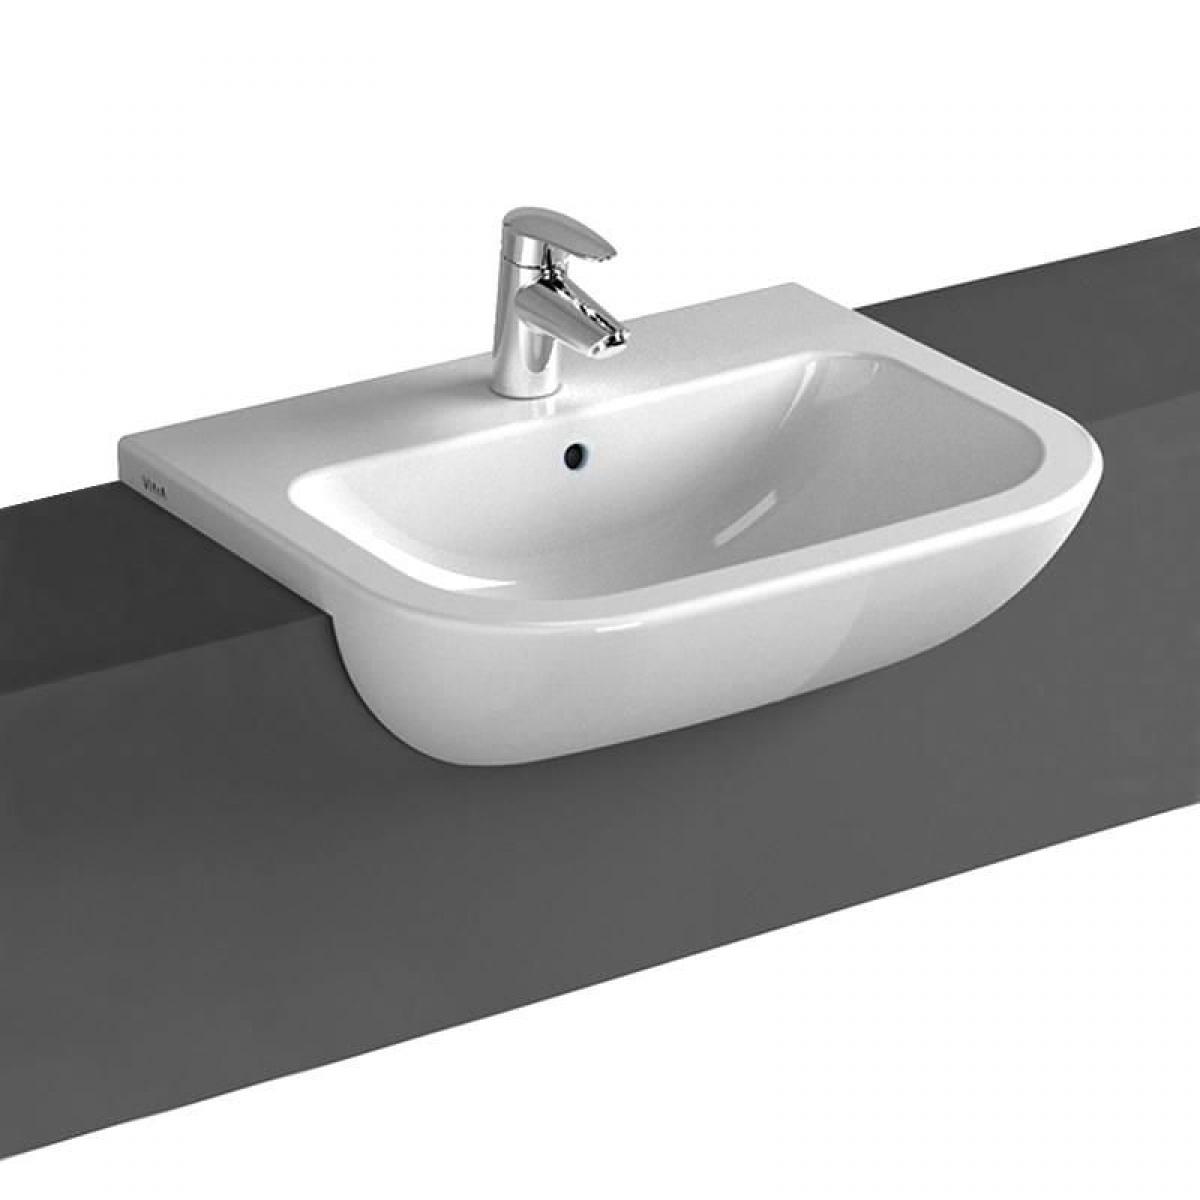 Inset wash basin vanity basin washbasins -  Vitra S20 Semi Recessed Washbasin